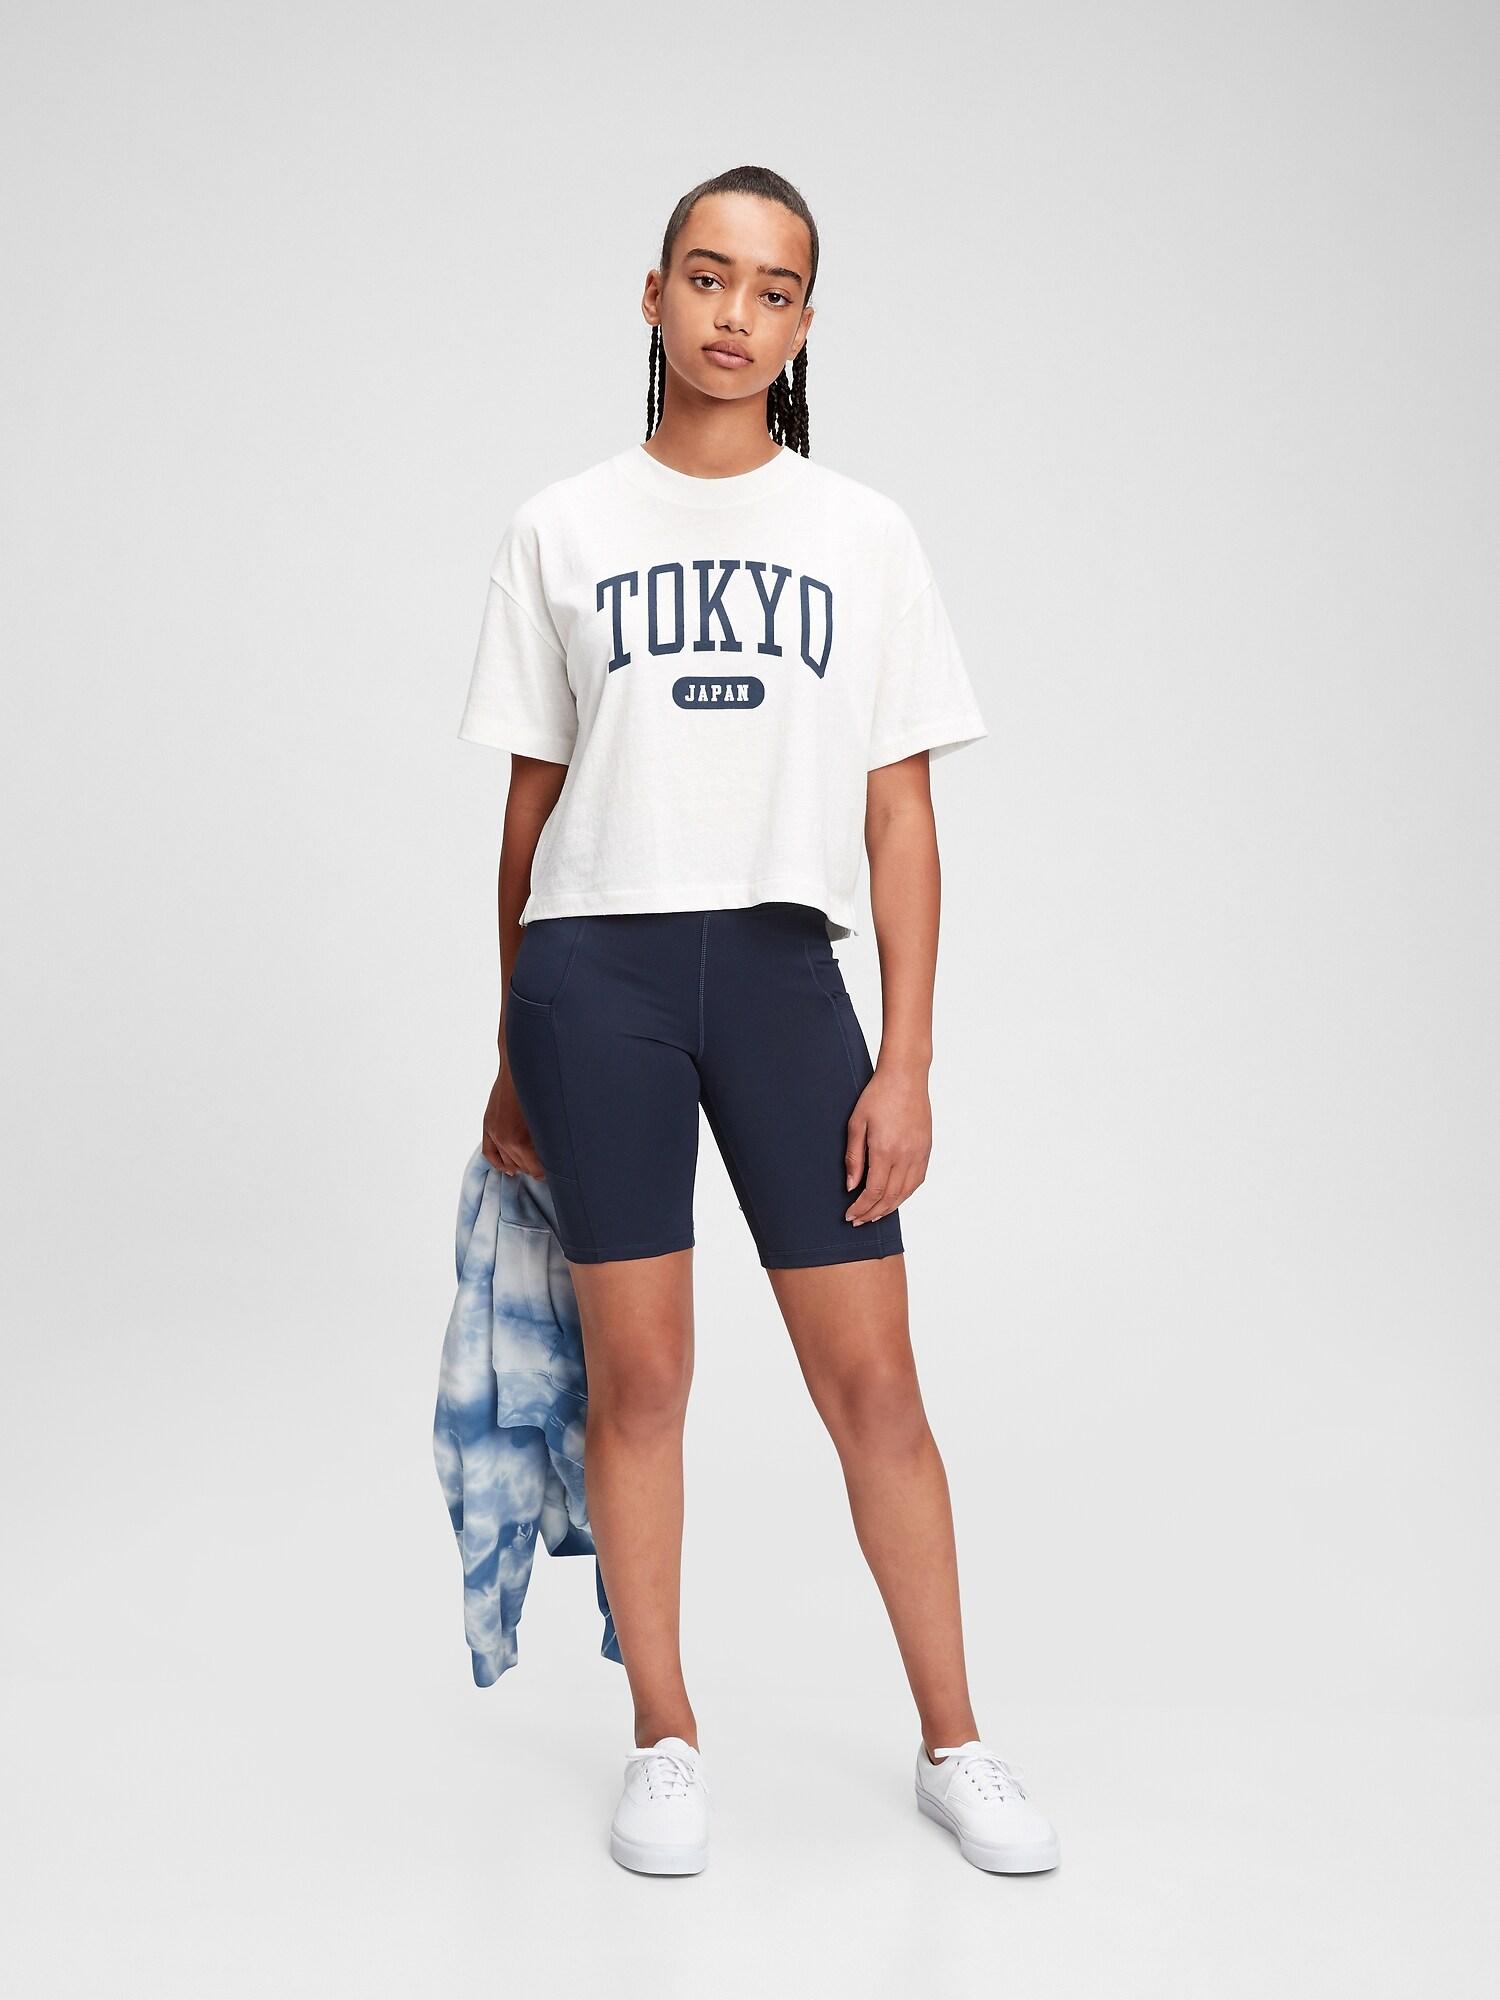 Tokyo Gapロゴtシャツ (ギャップティーン)